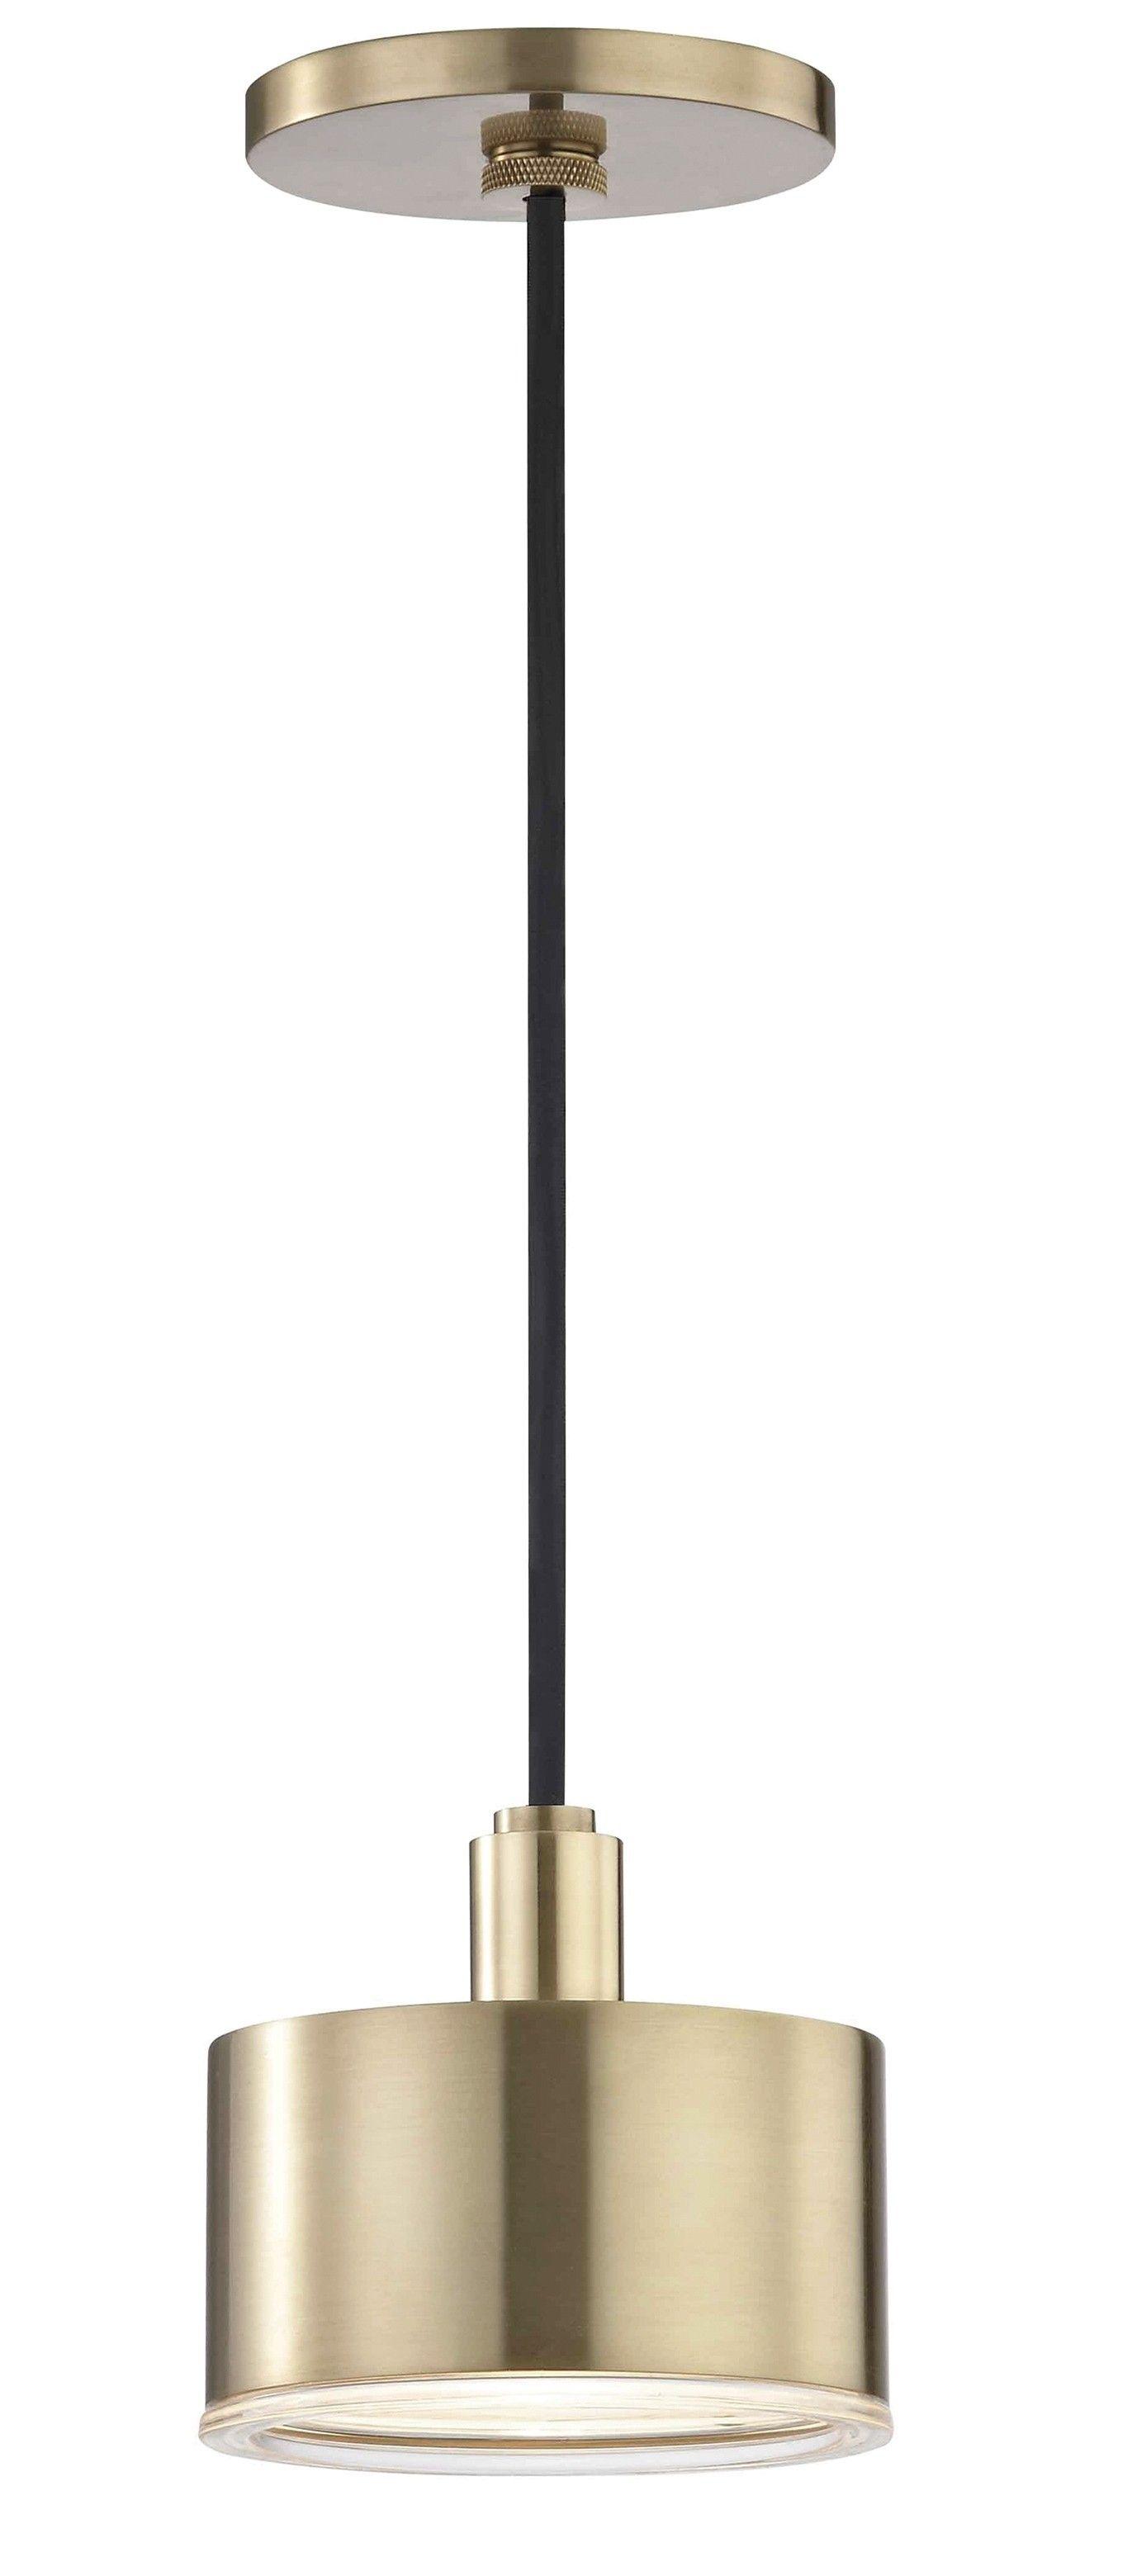 Aged Br Pendant Lamp